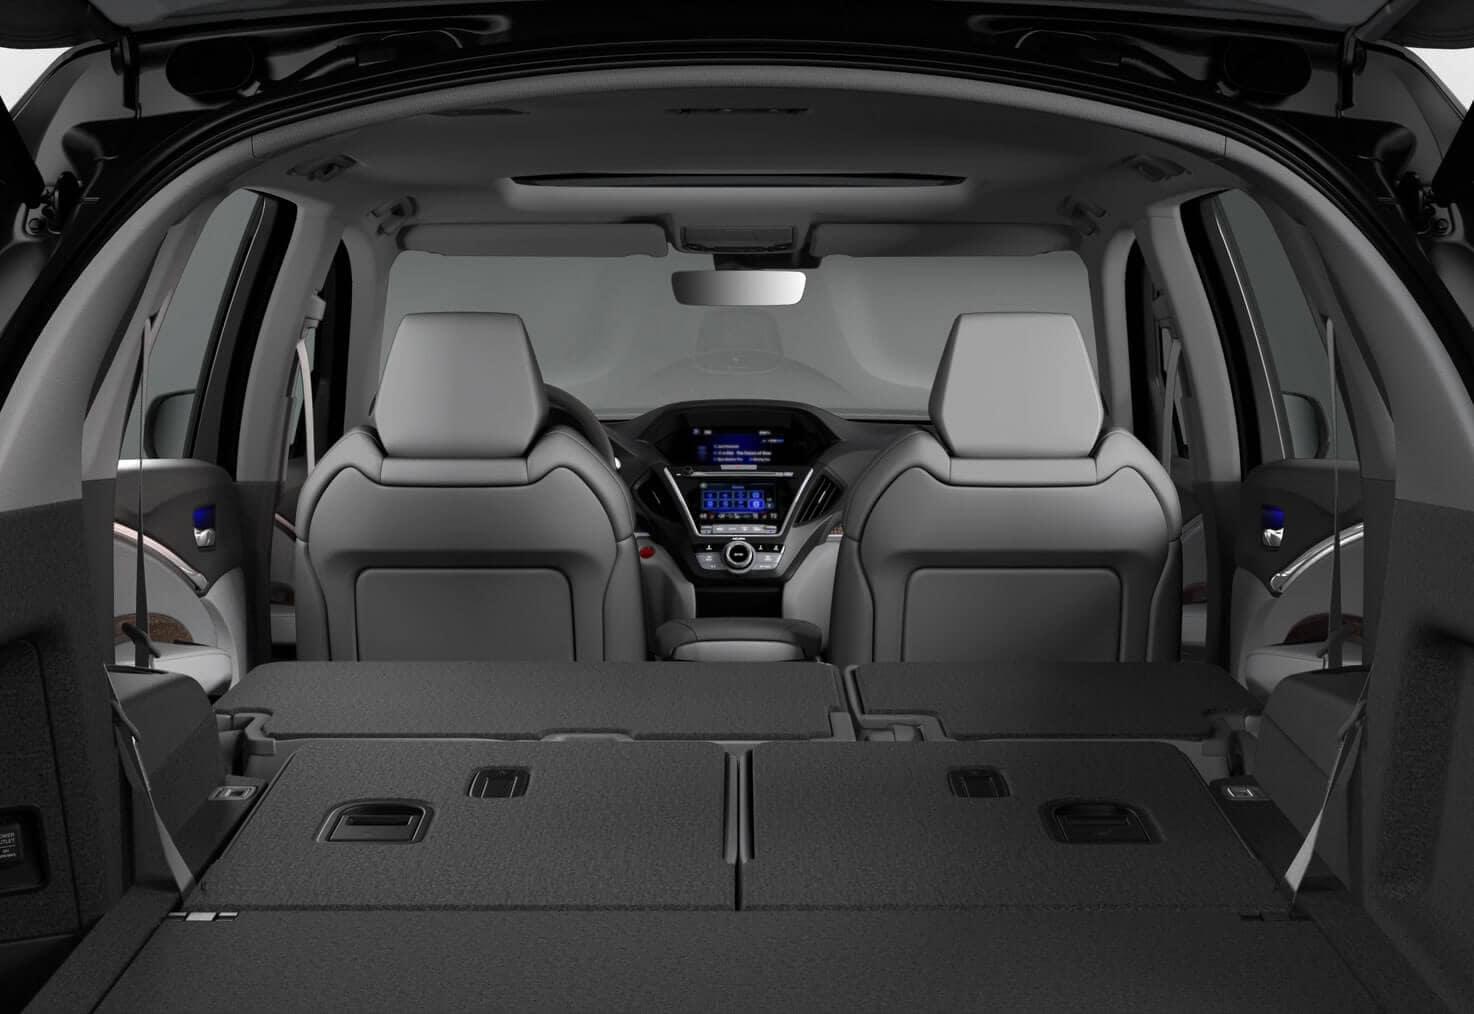 2018 Acura MDX Interior Cargo Area